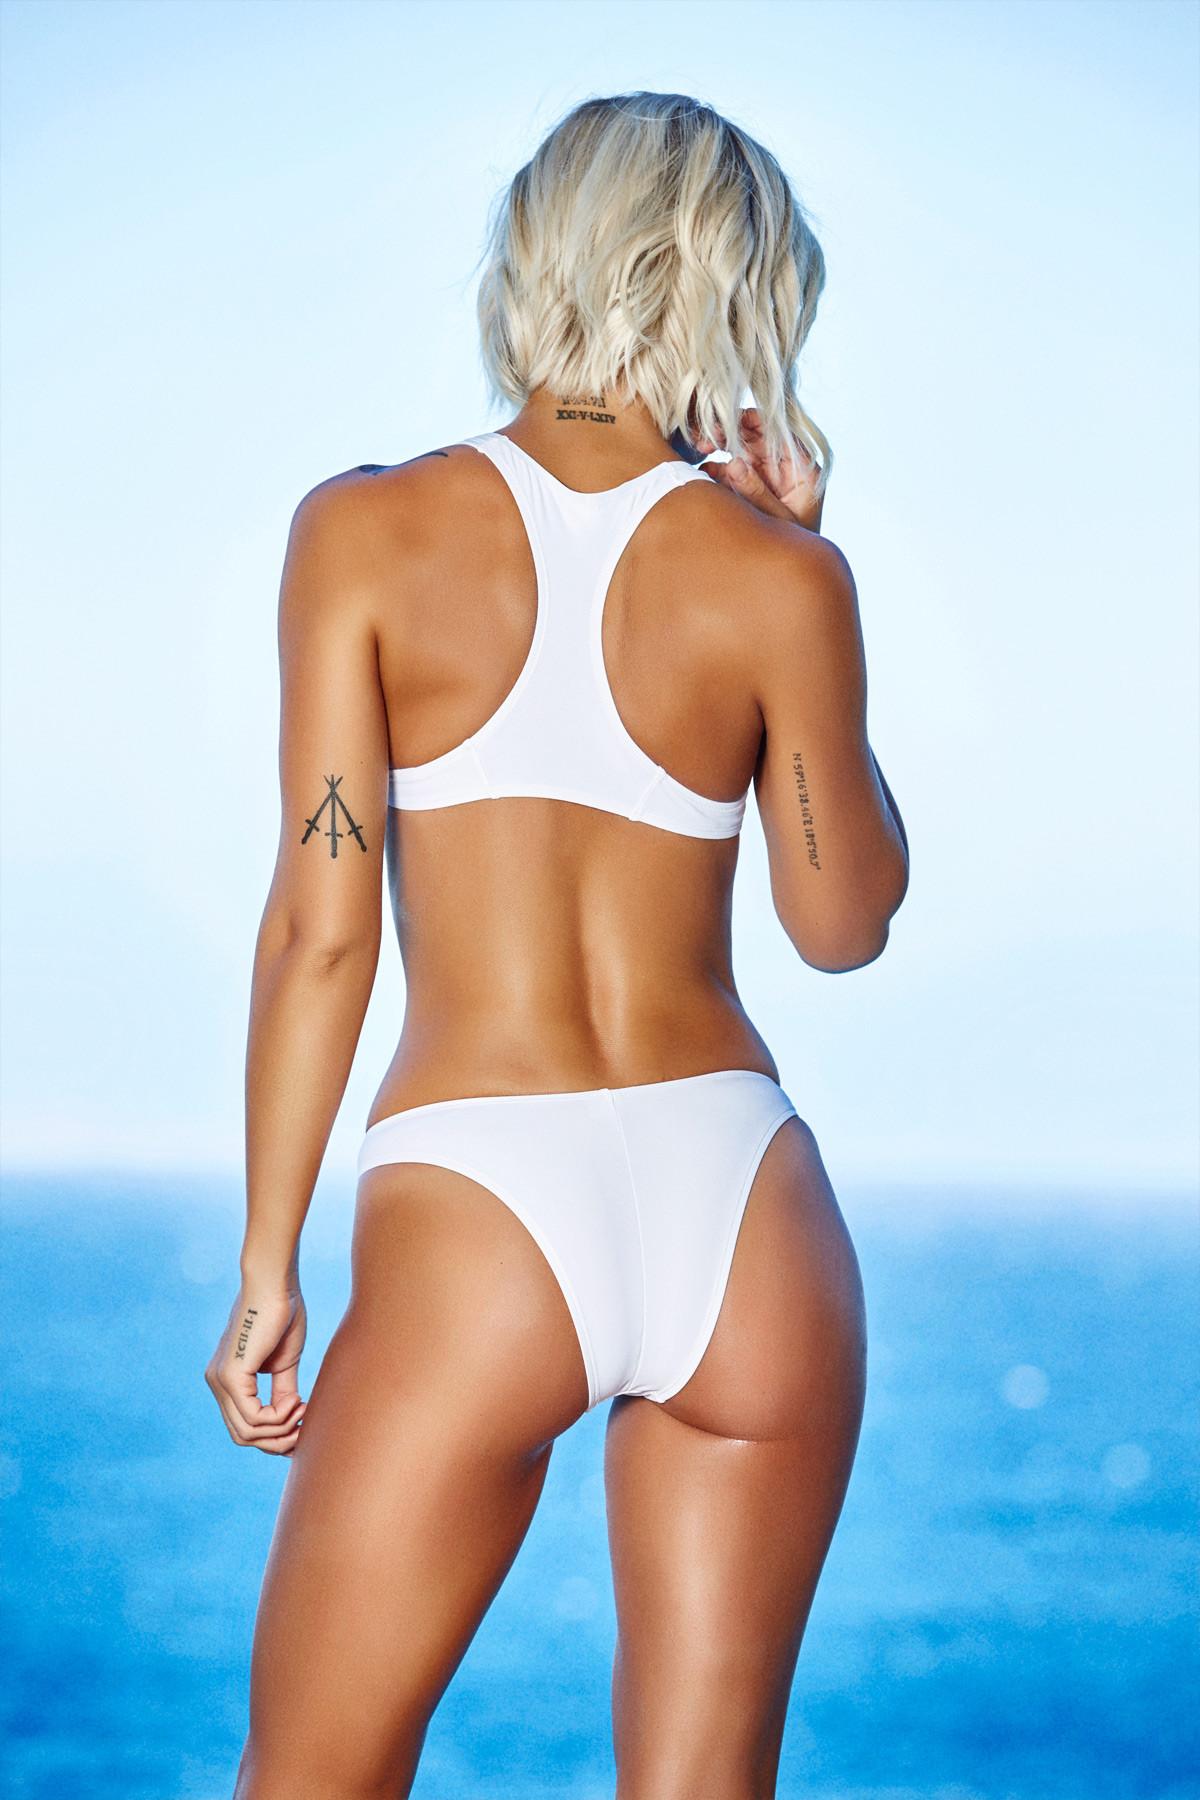 White Underboob Bikini Tigelle Com Intimates And